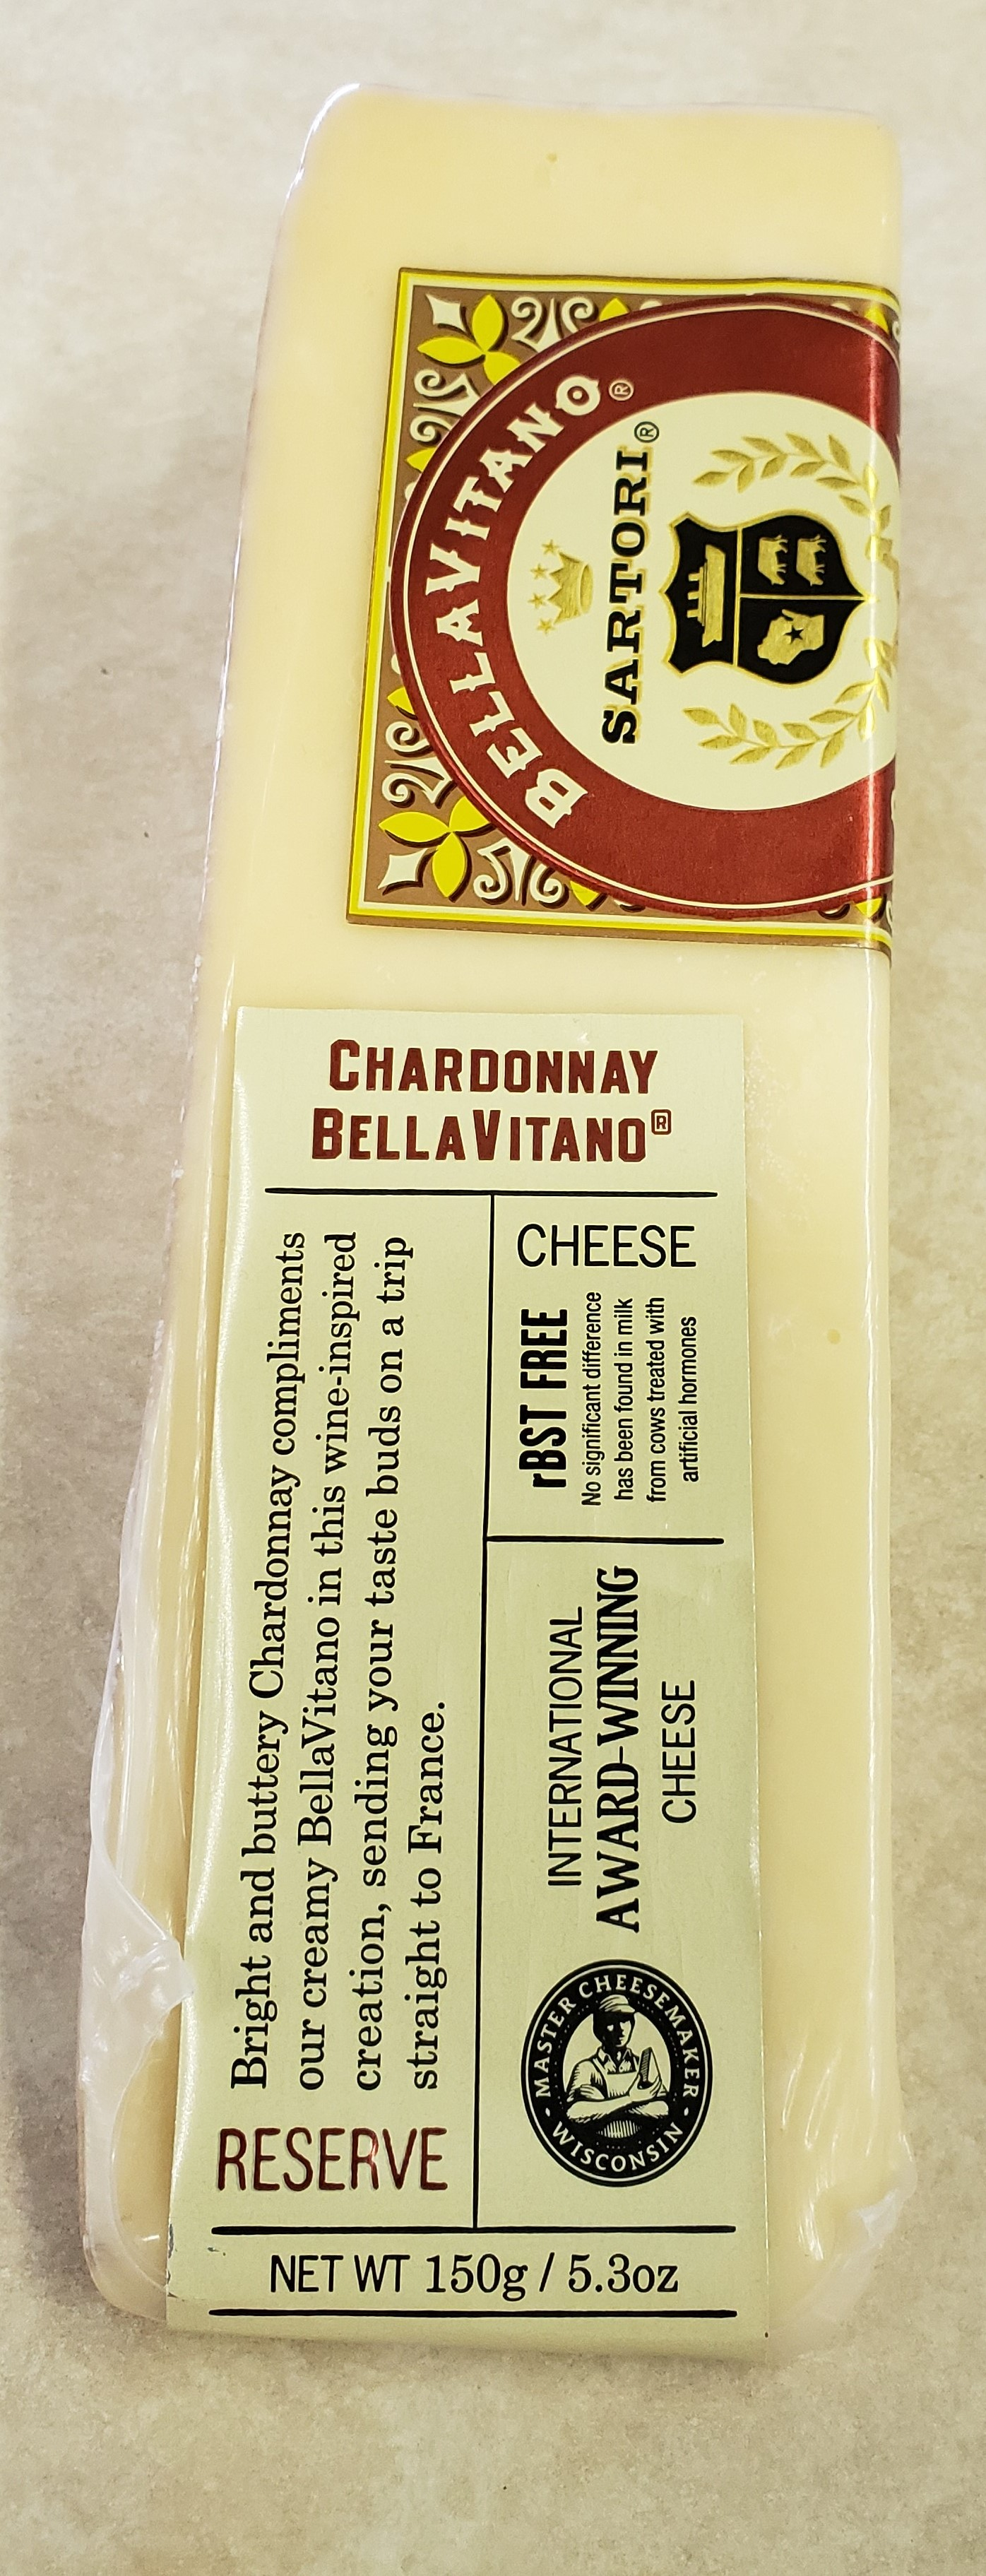 Sartori Chardonnay Bellavitano Wedge